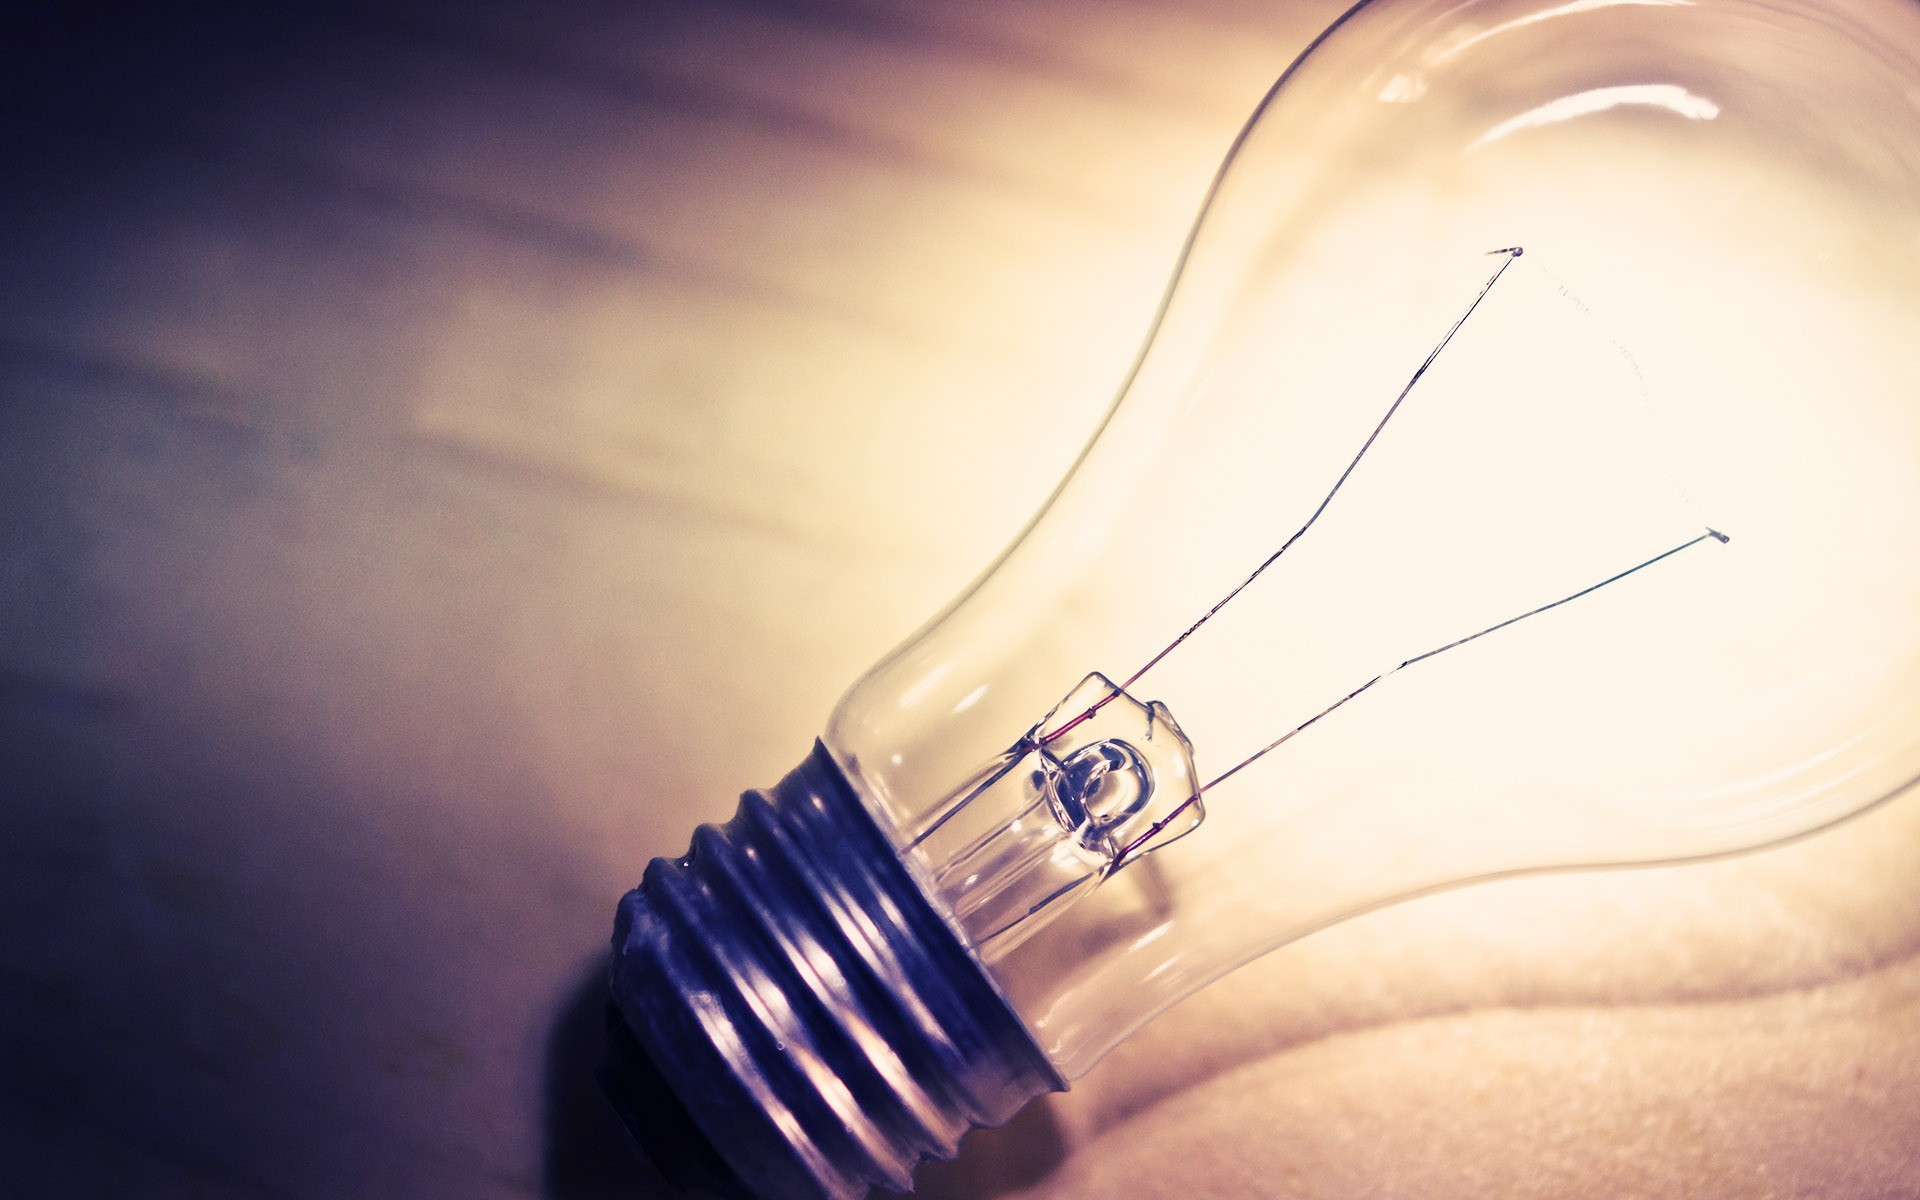 Light Bulb Wallpapers (64  images) for Idea Light Bulb Wallpaper  174mzq